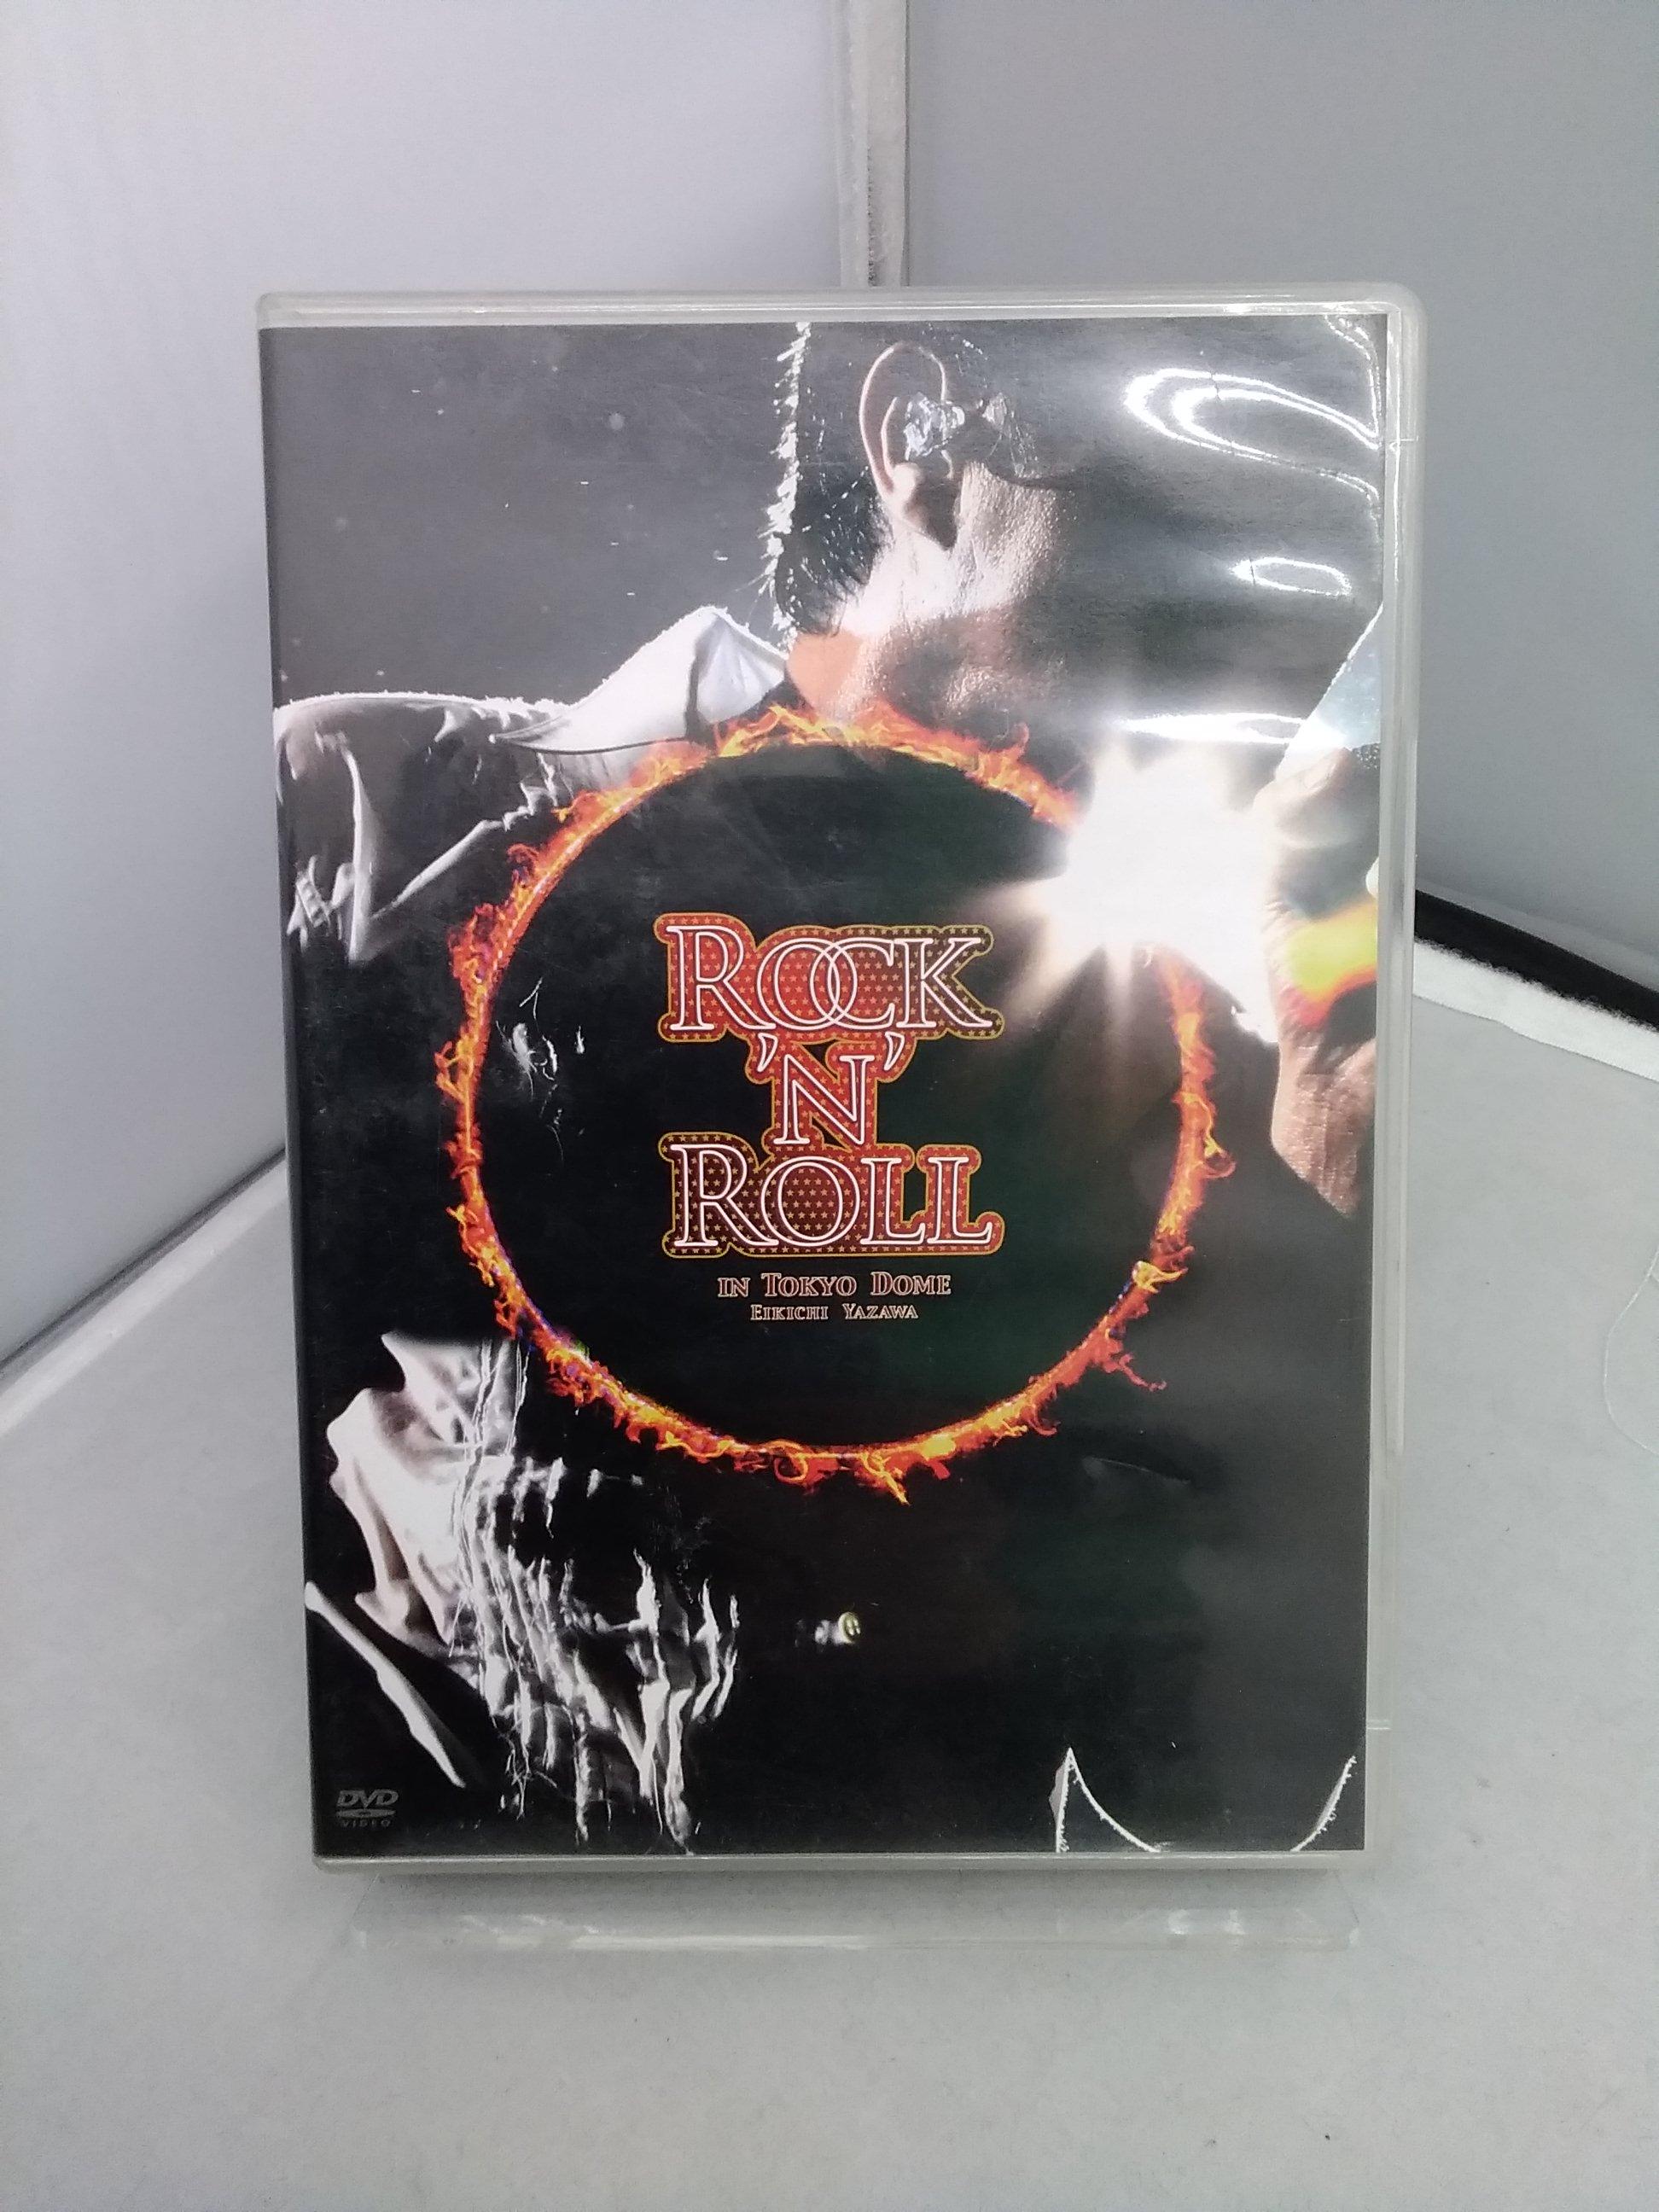 ROCK'N 'ROLL IN TOKYO DOME|GARURU RECORDS